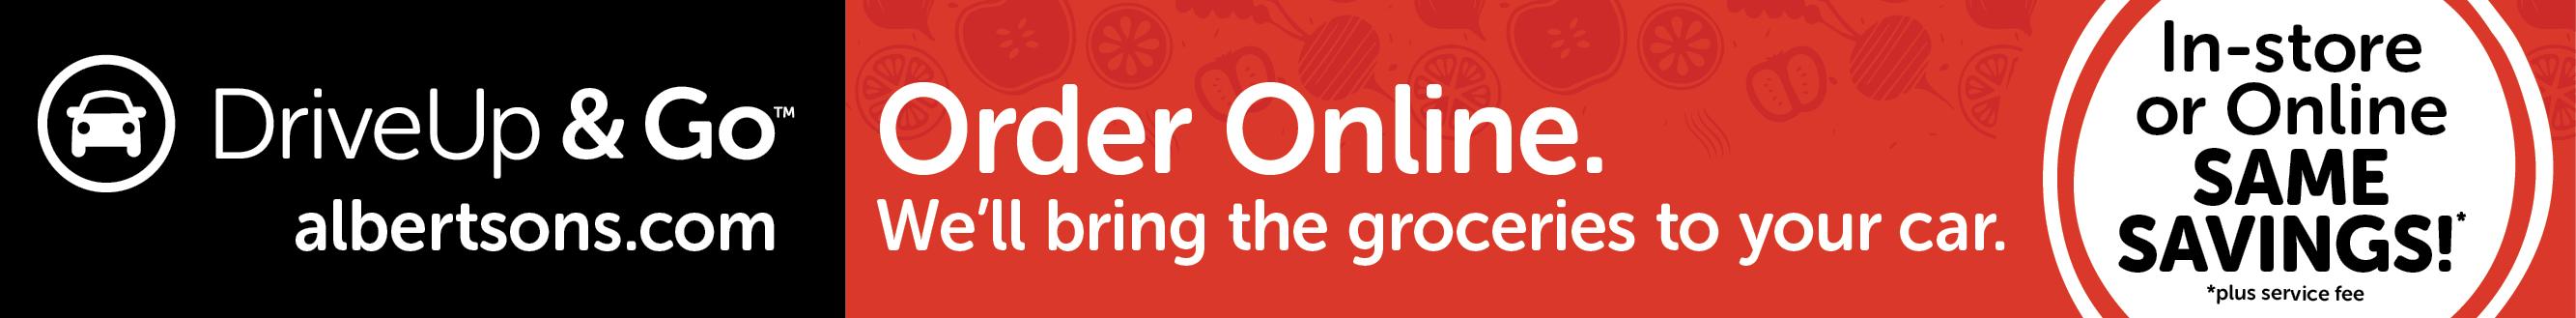 Albertsons.com, Order Online